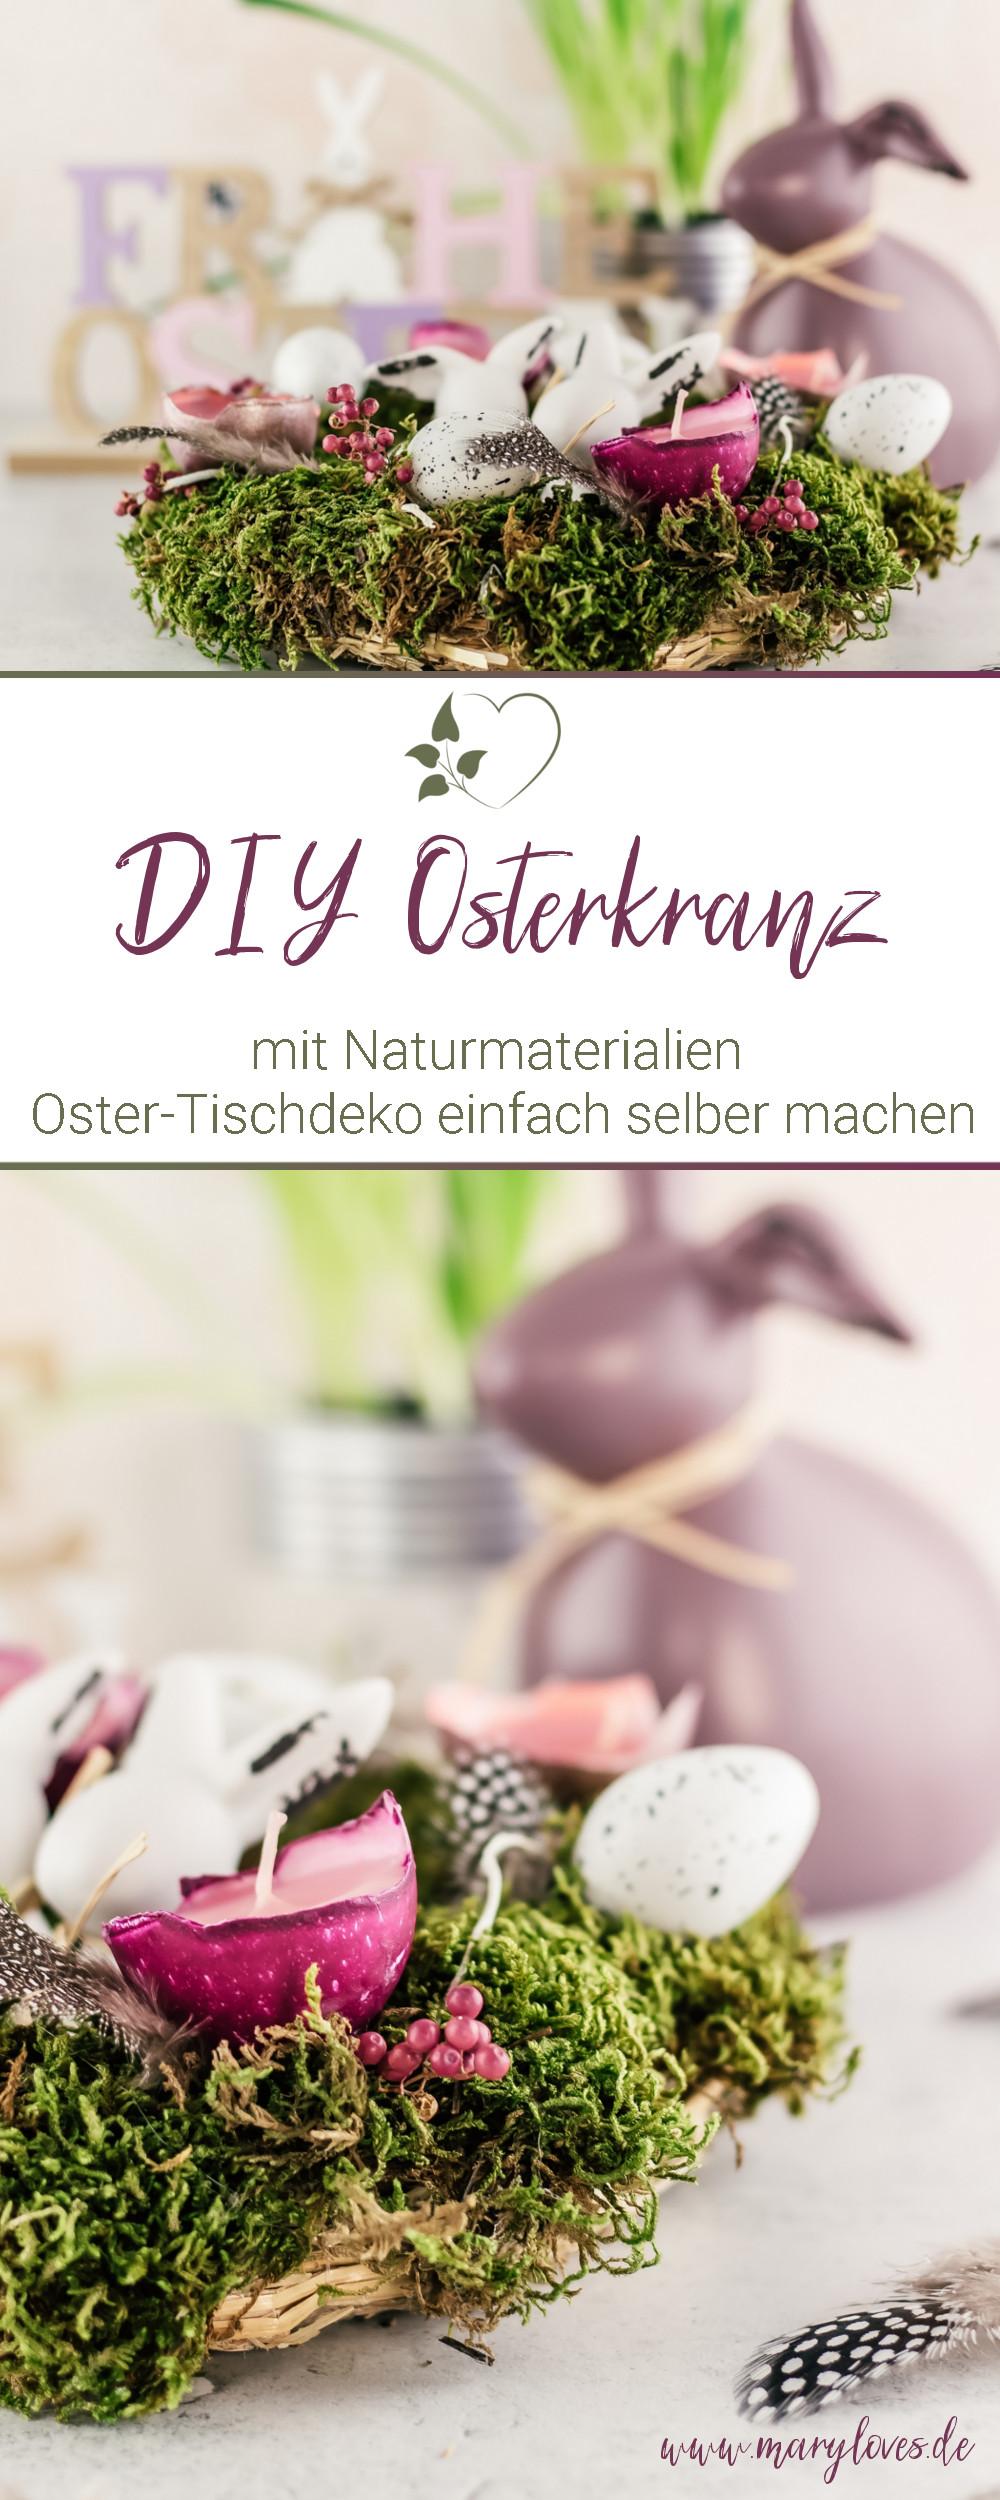 DIY Osterdeko - Osterkranz aus Naturmaterialien selber machen - #osterdeko #osterkranz #ostern #osterdiy #osterbasteln #naturmaterialien #frühling